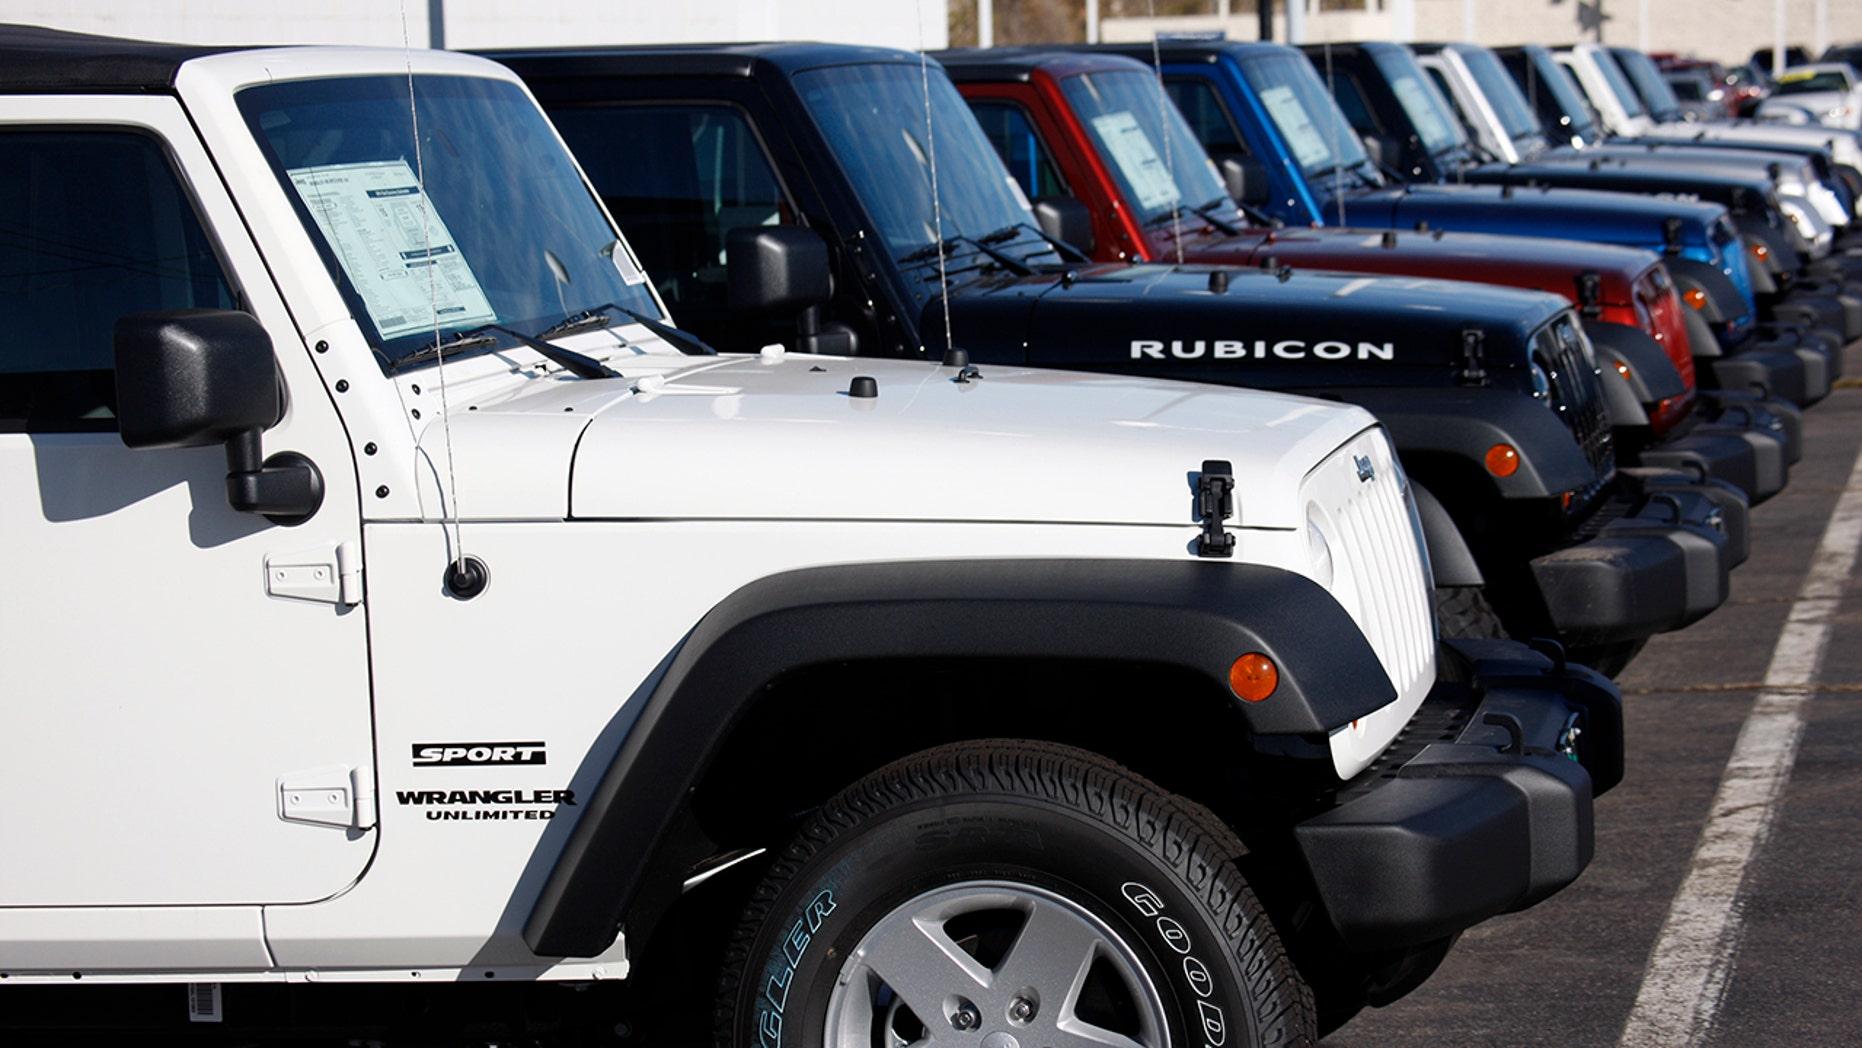 50f7a9fa8b5 Fiat Chrysler recalling 1.6 million vehicles to fix Takata air bags ...